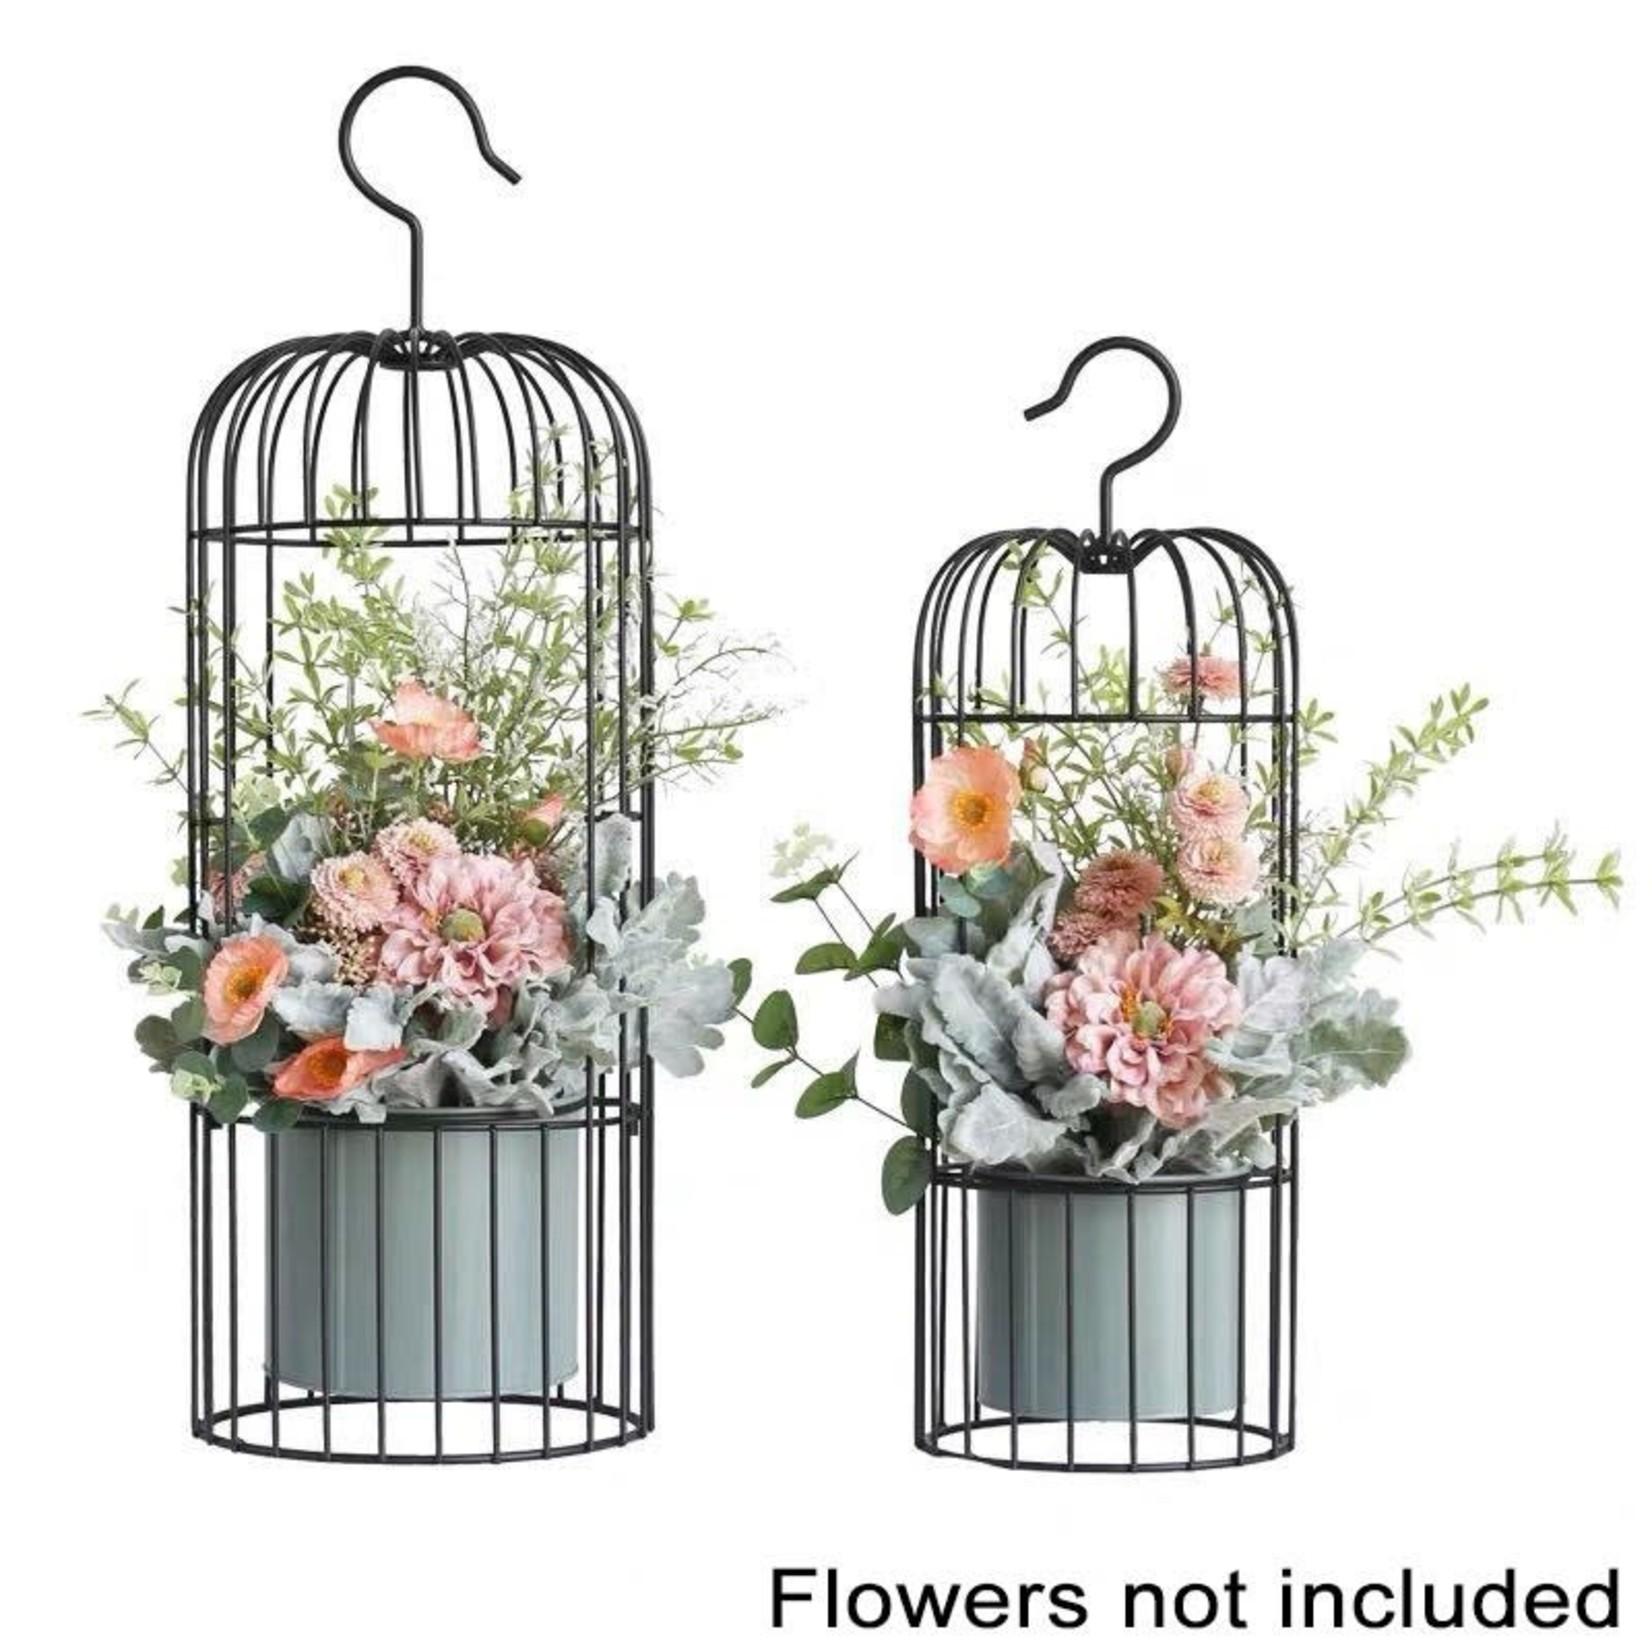 Hanging Bird Cage Planters